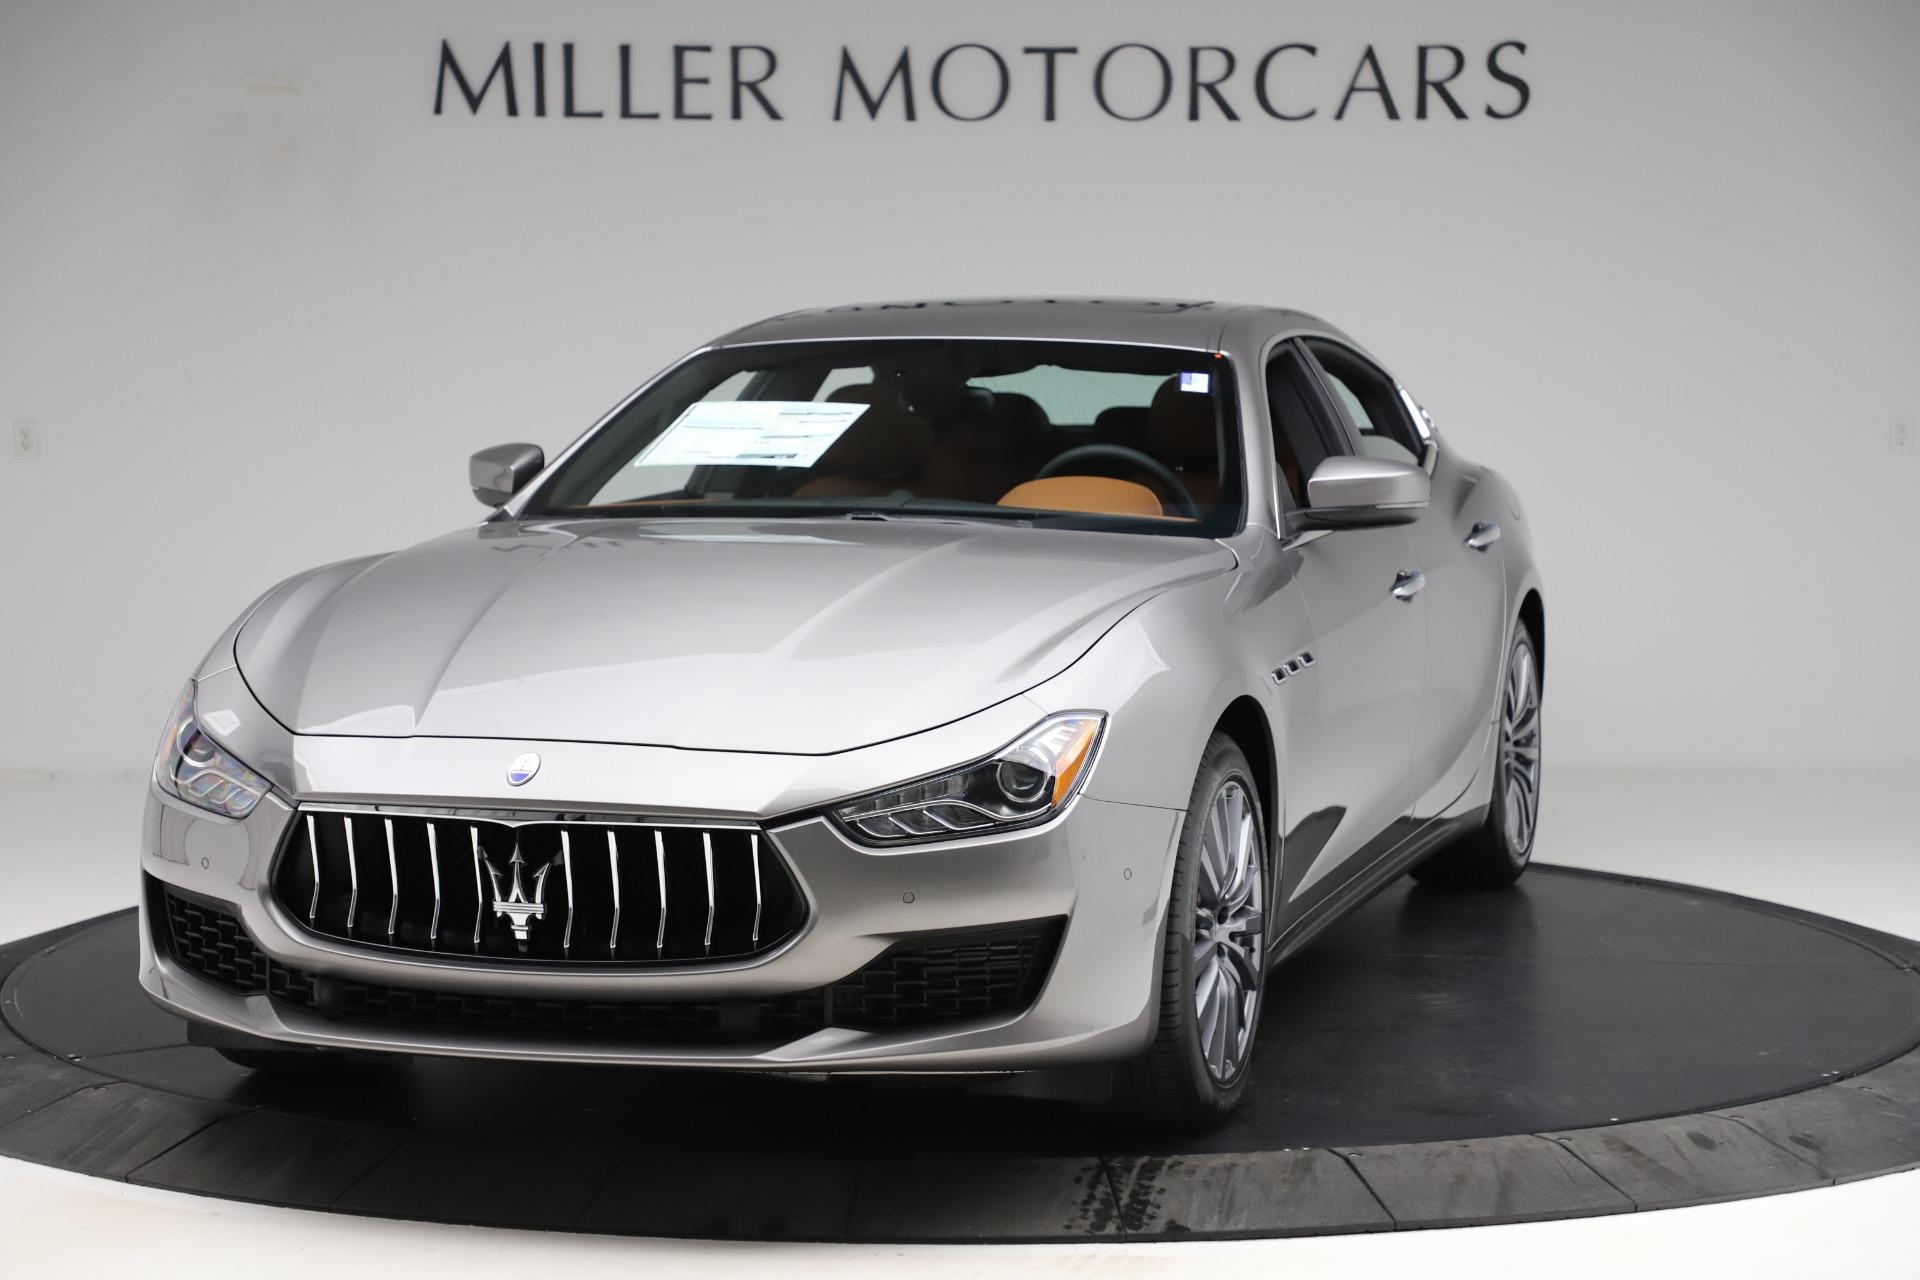 New 2020 Maserati Ghibli S Q4 for sale $63,244 at Rolls-Royce Motor Cars Greenwich in Greenwich CT 06830 1